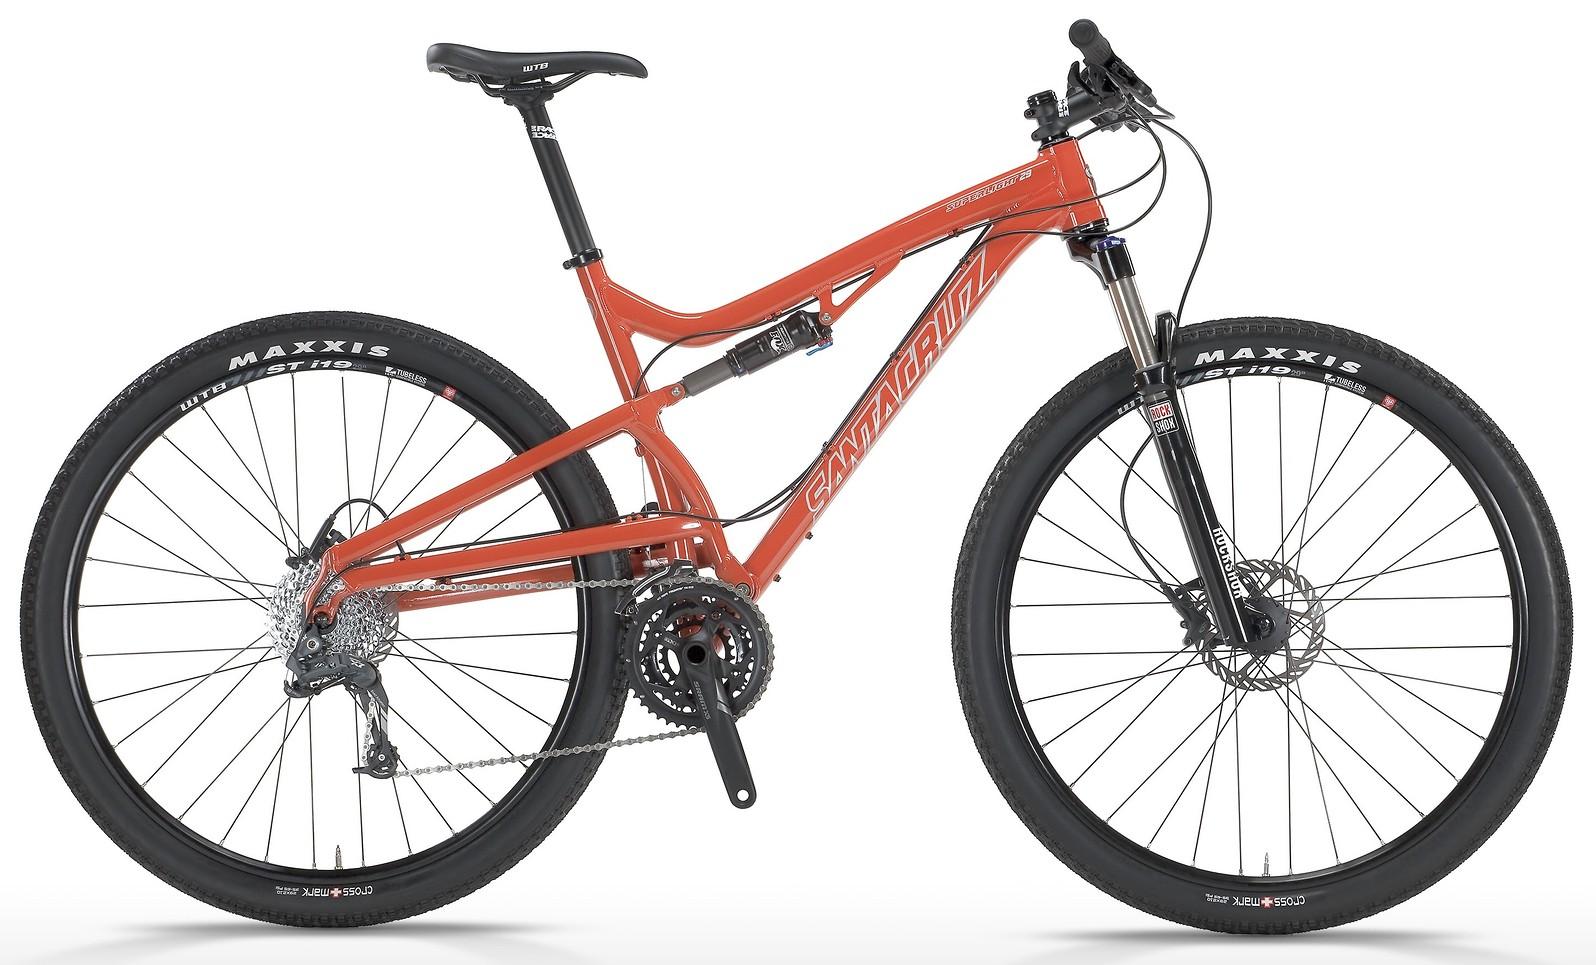 2014 Santa Cruz Superlight 29 R XC 29 Bike 2013 SUPERLIGHT29catalogflat